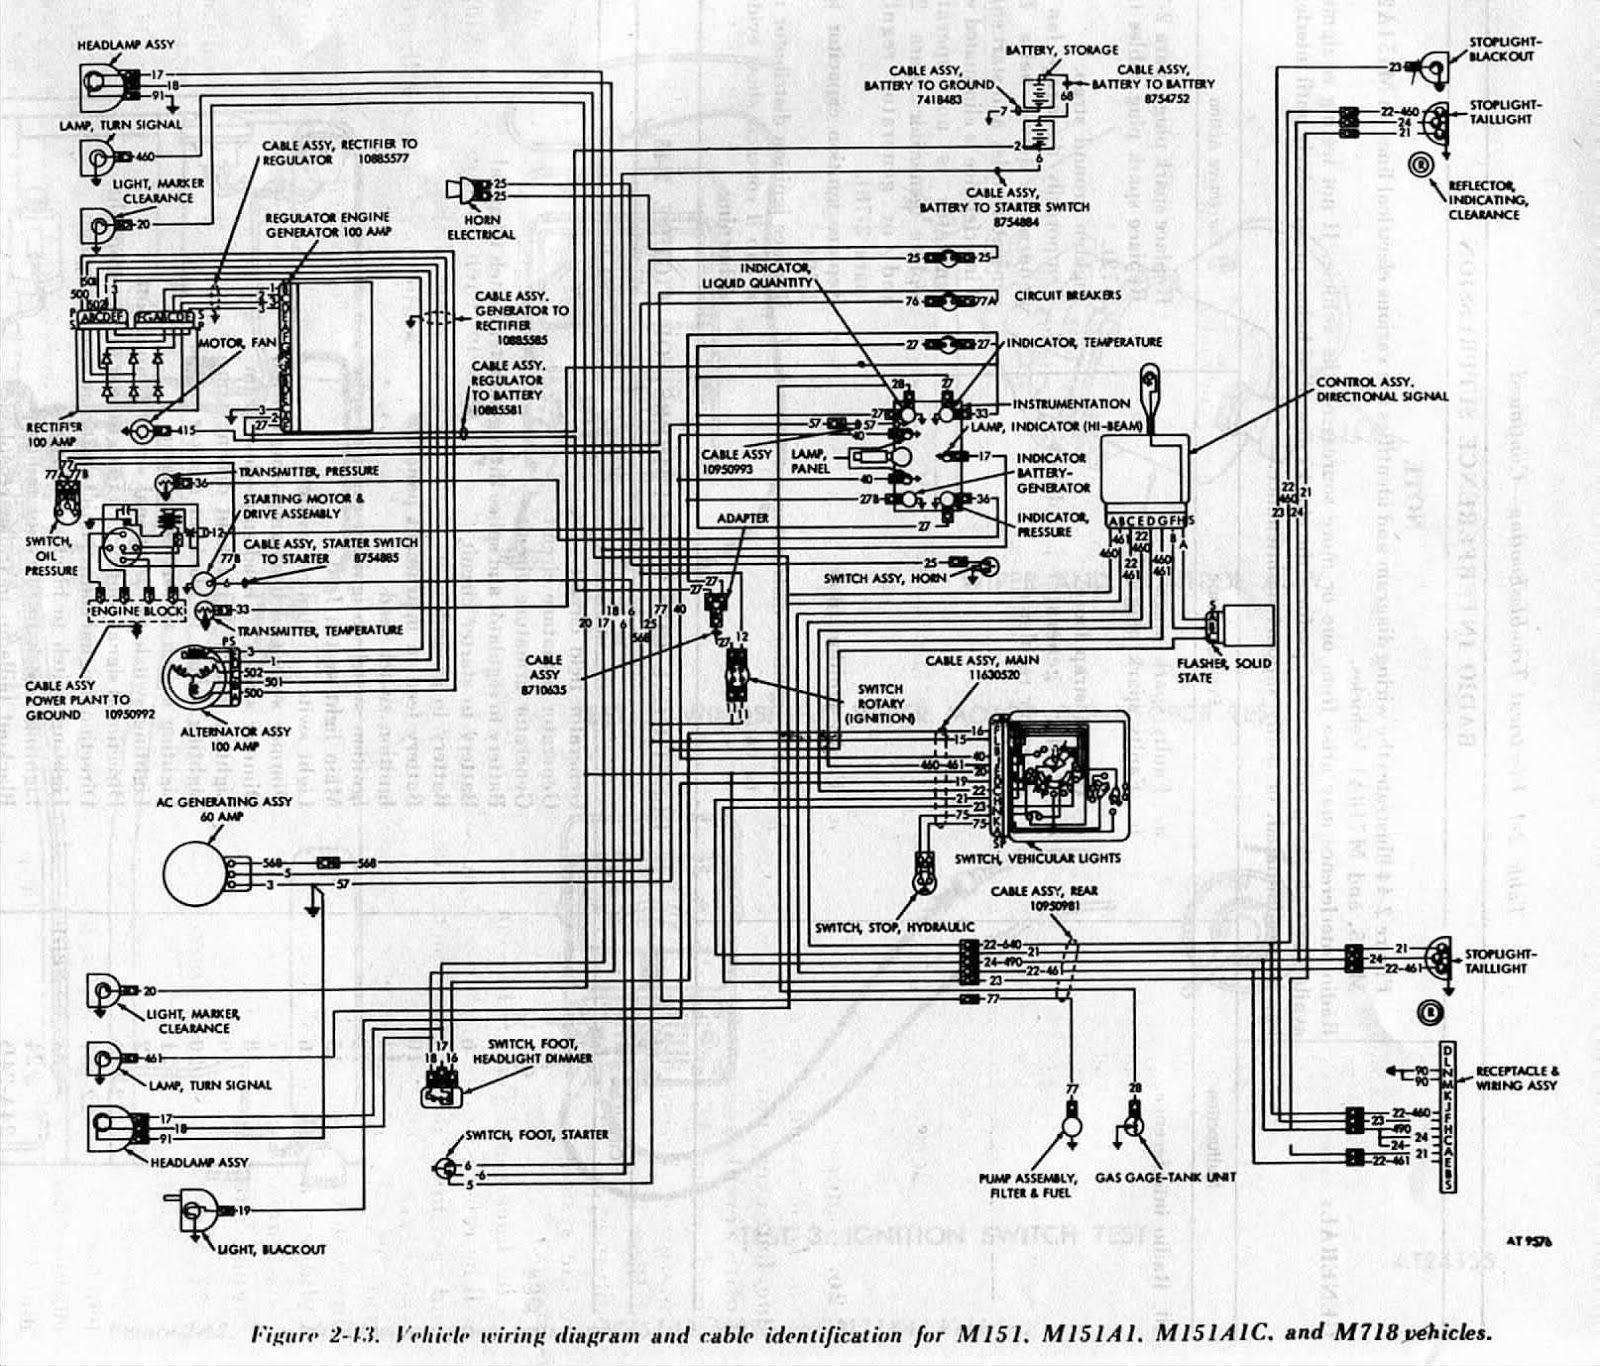 Diagram Acura Tl Wiring Diagrams Automotive Full Version Hd Quality Diagrams Automotive Tabletodiagram Edelynetaxi Fr